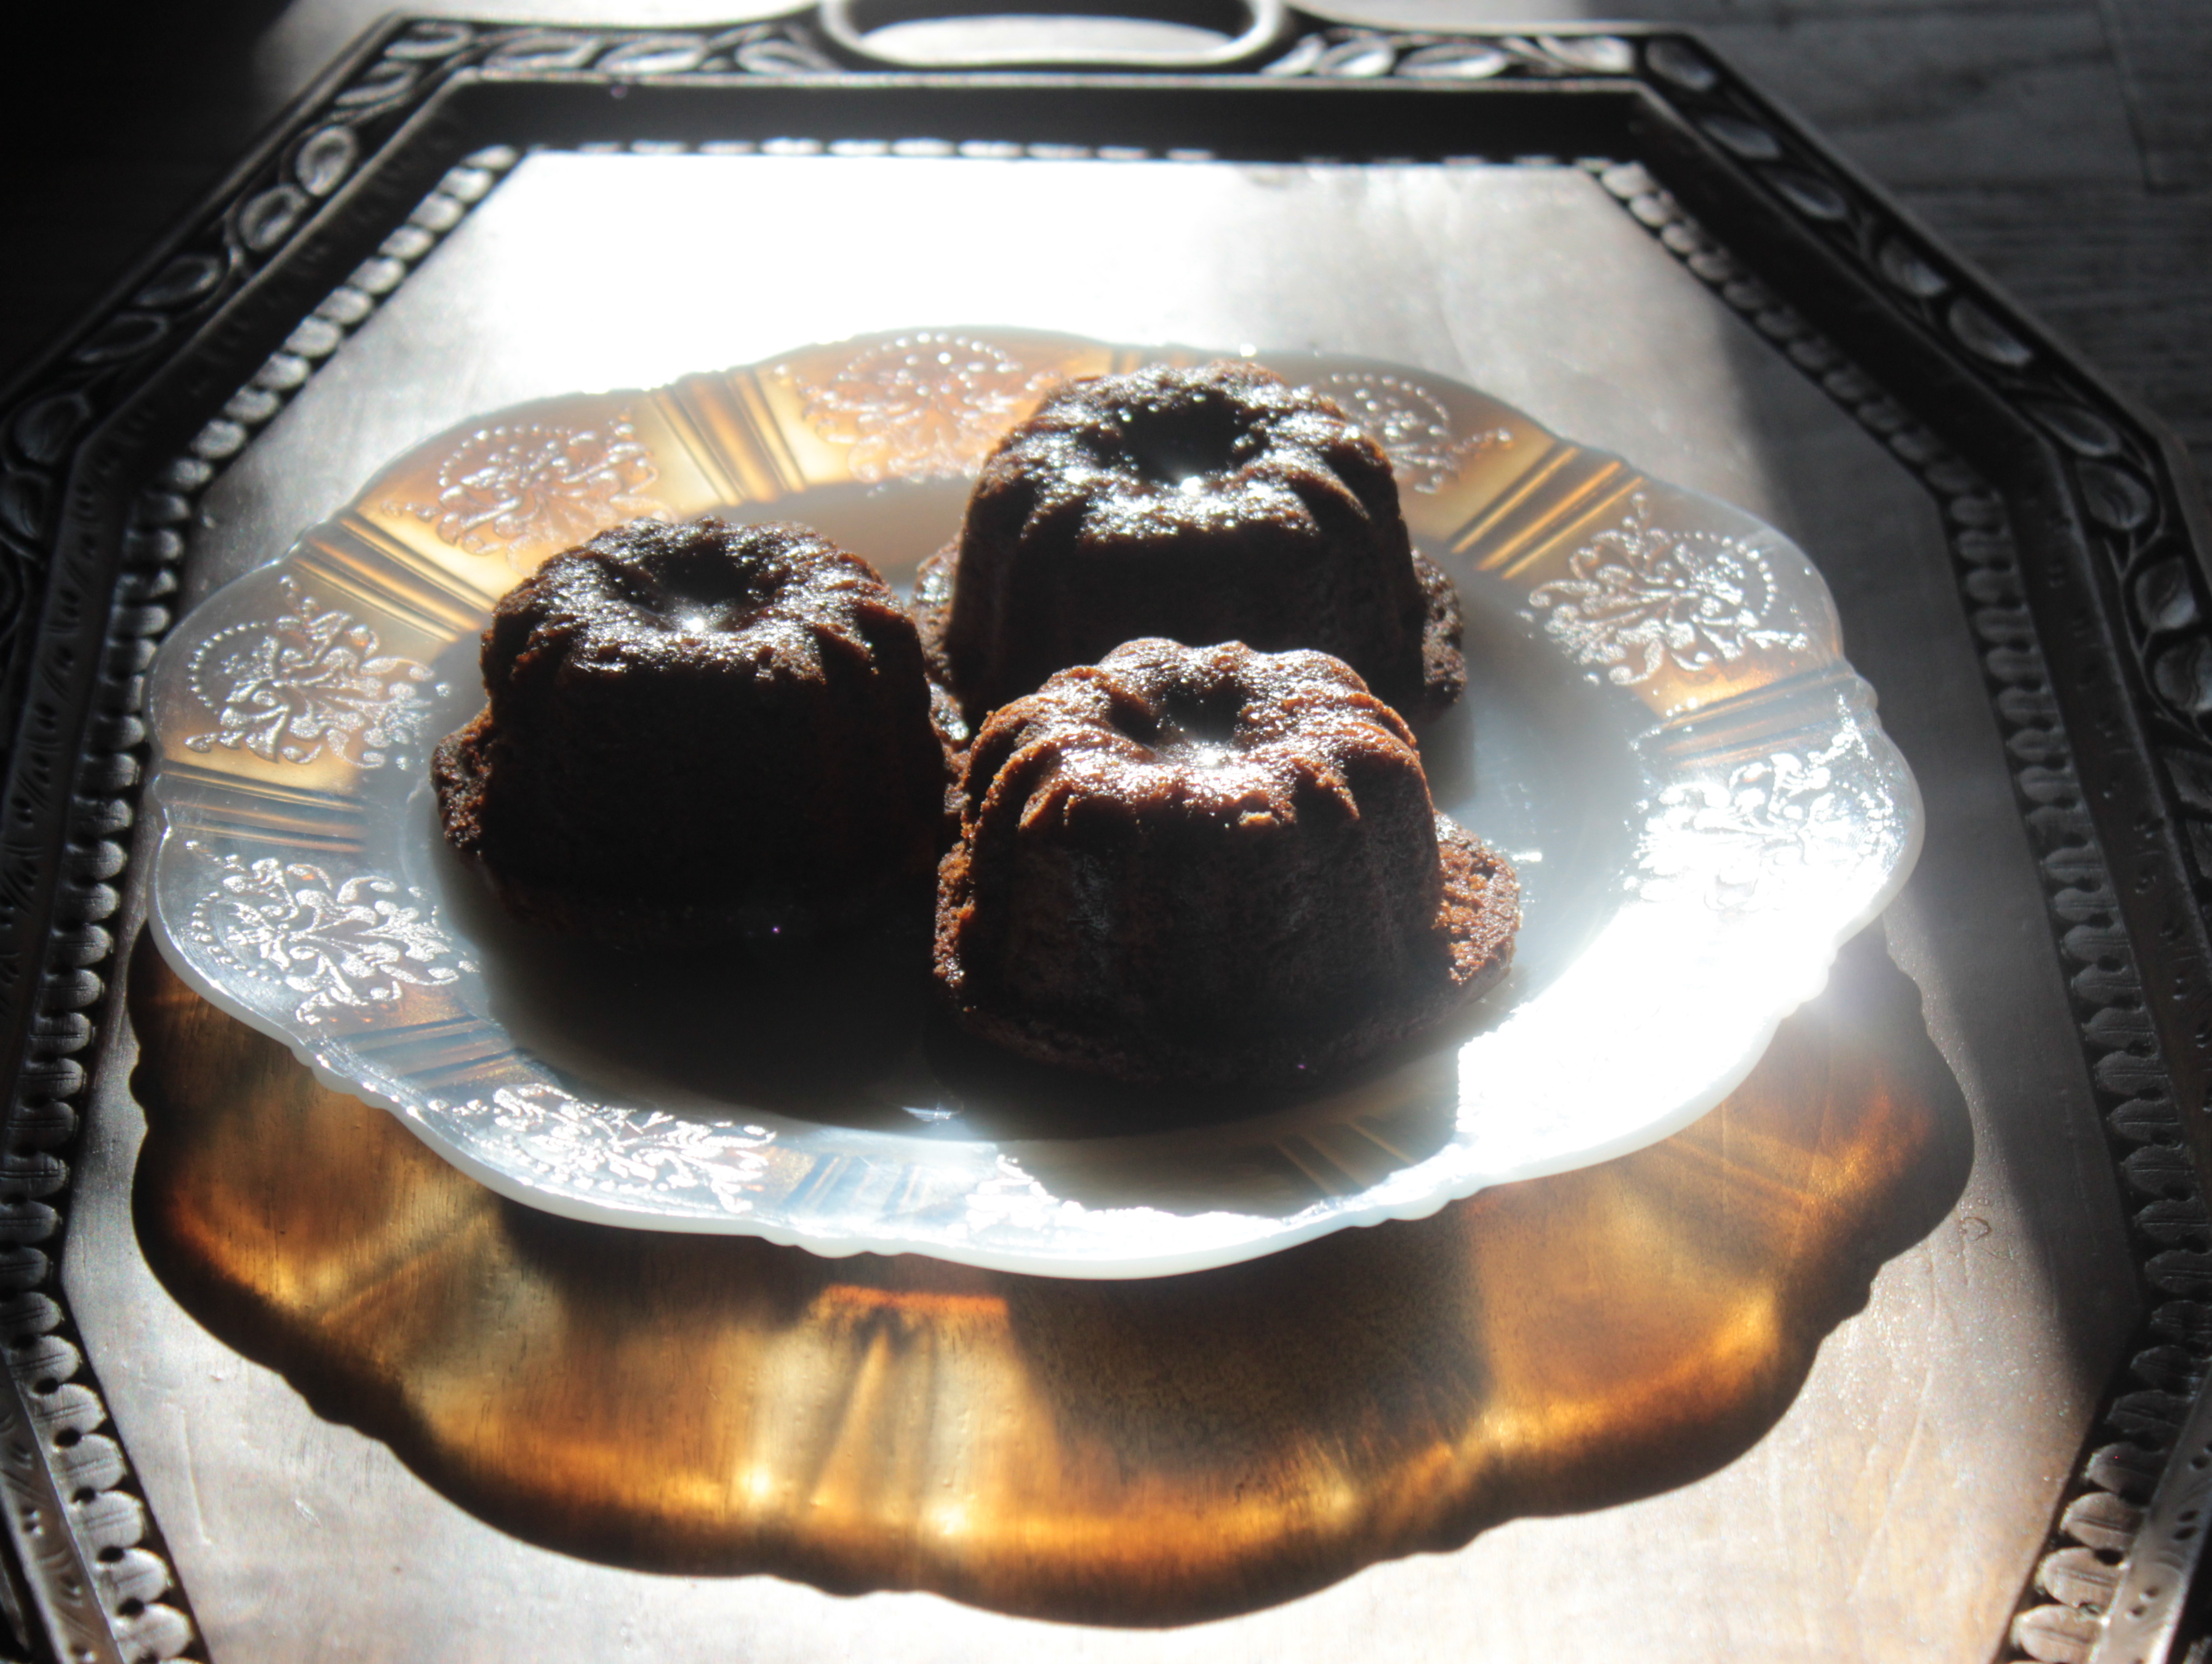 Sticky, Boozy Chocolate Plum Pudding Cake (Gluten-free or not) | Big ...